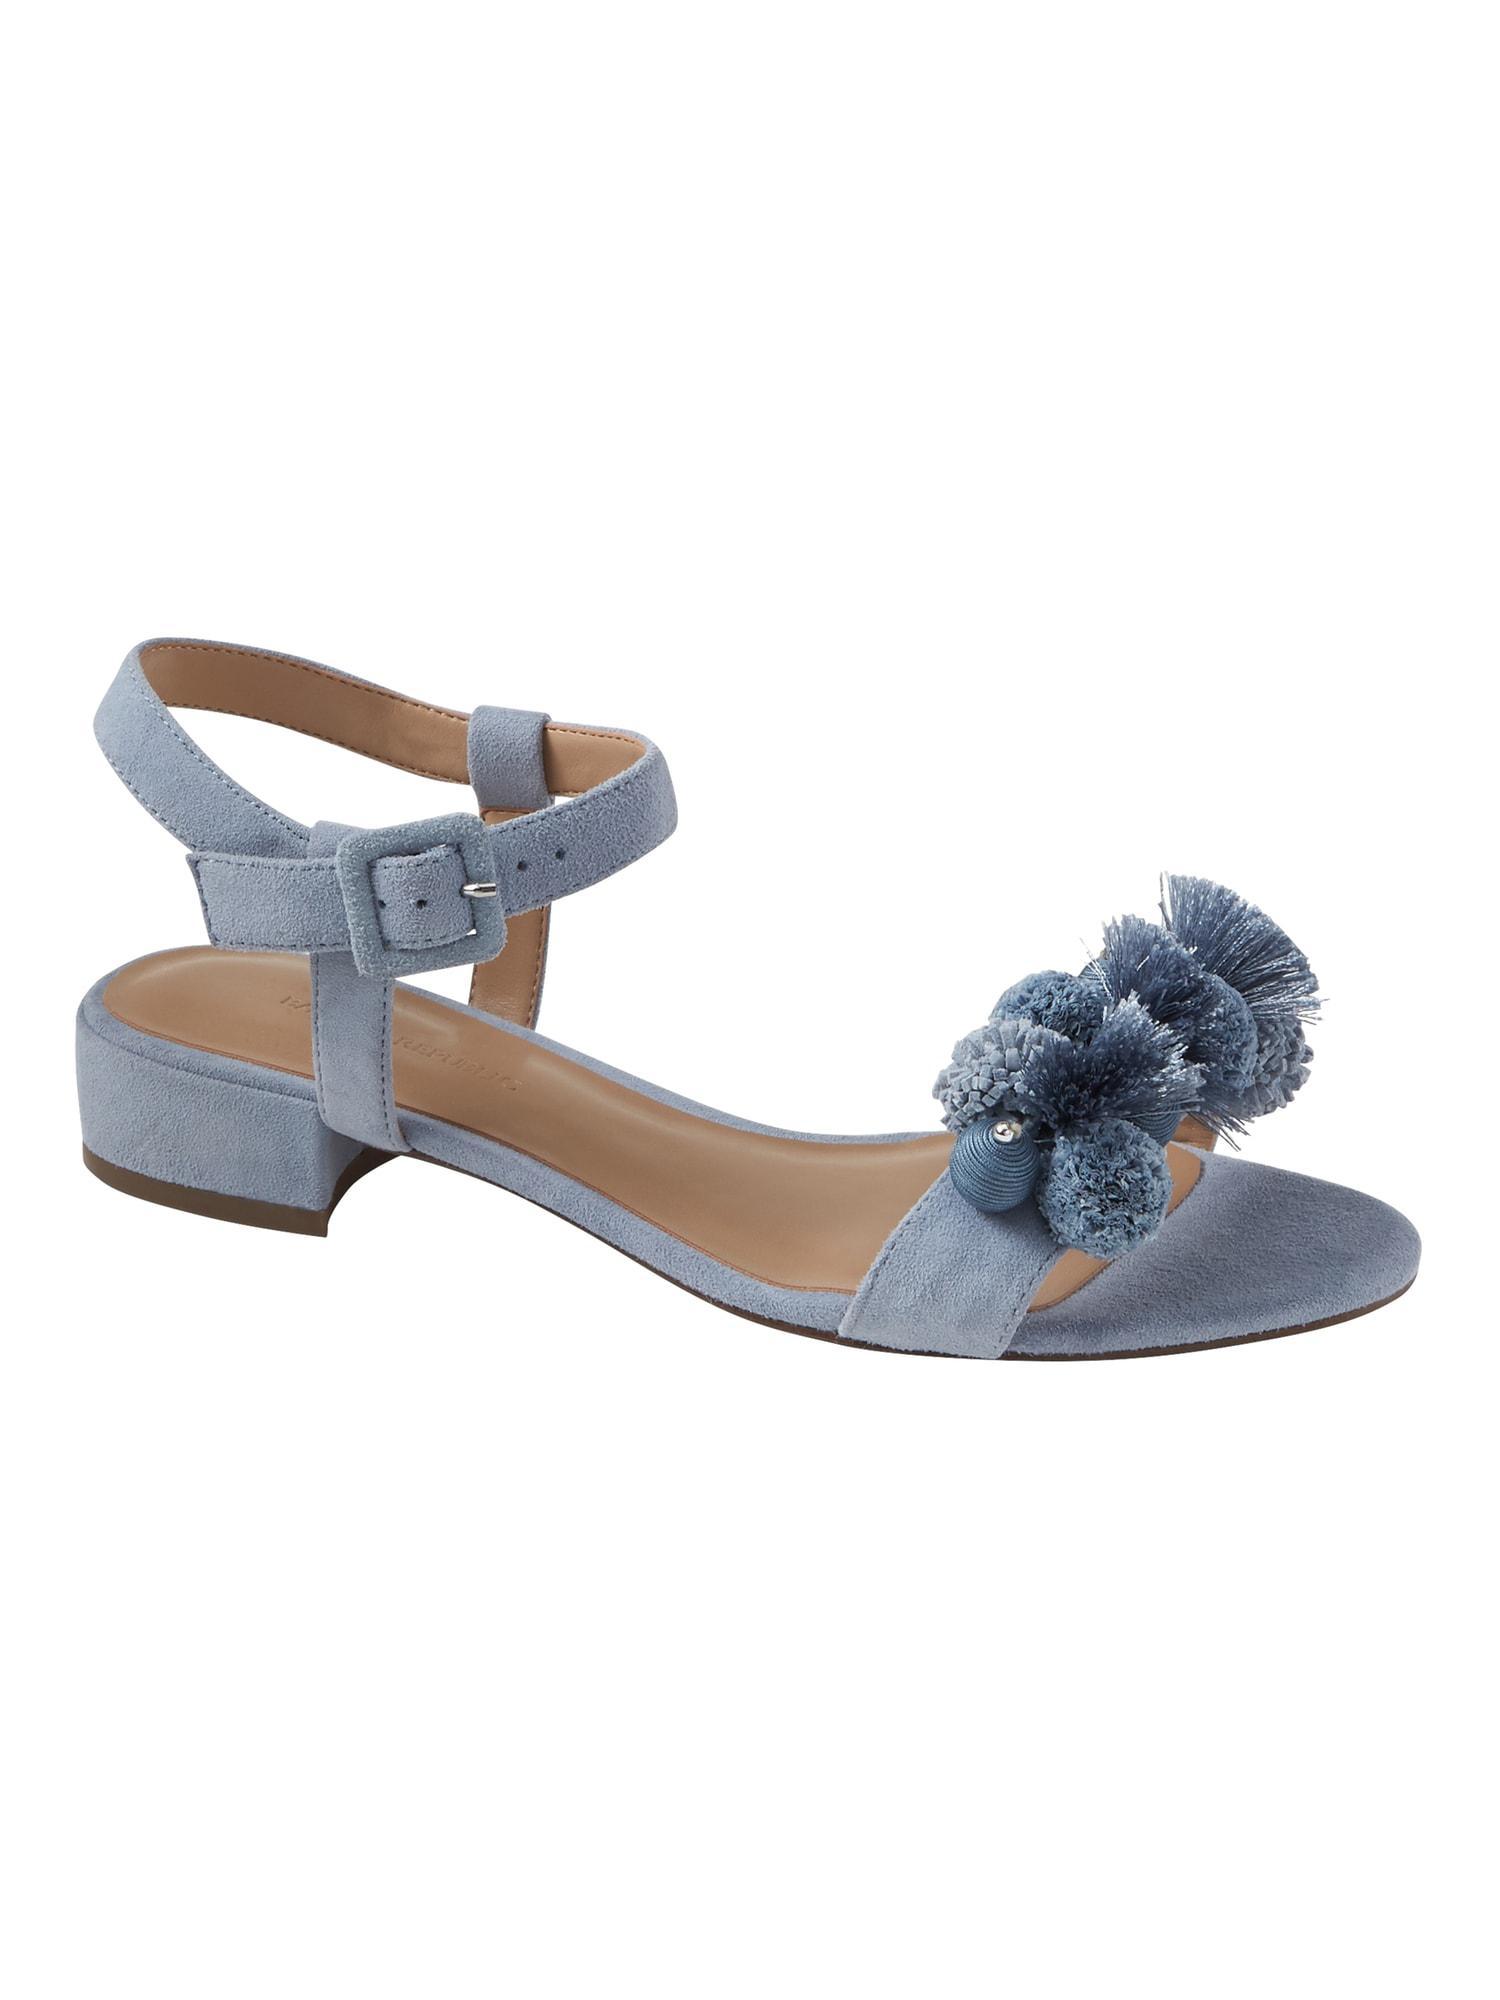 4da9d48ce98c Lyst - Banana Republic Pom Pom Low Heel Sandal in Blue